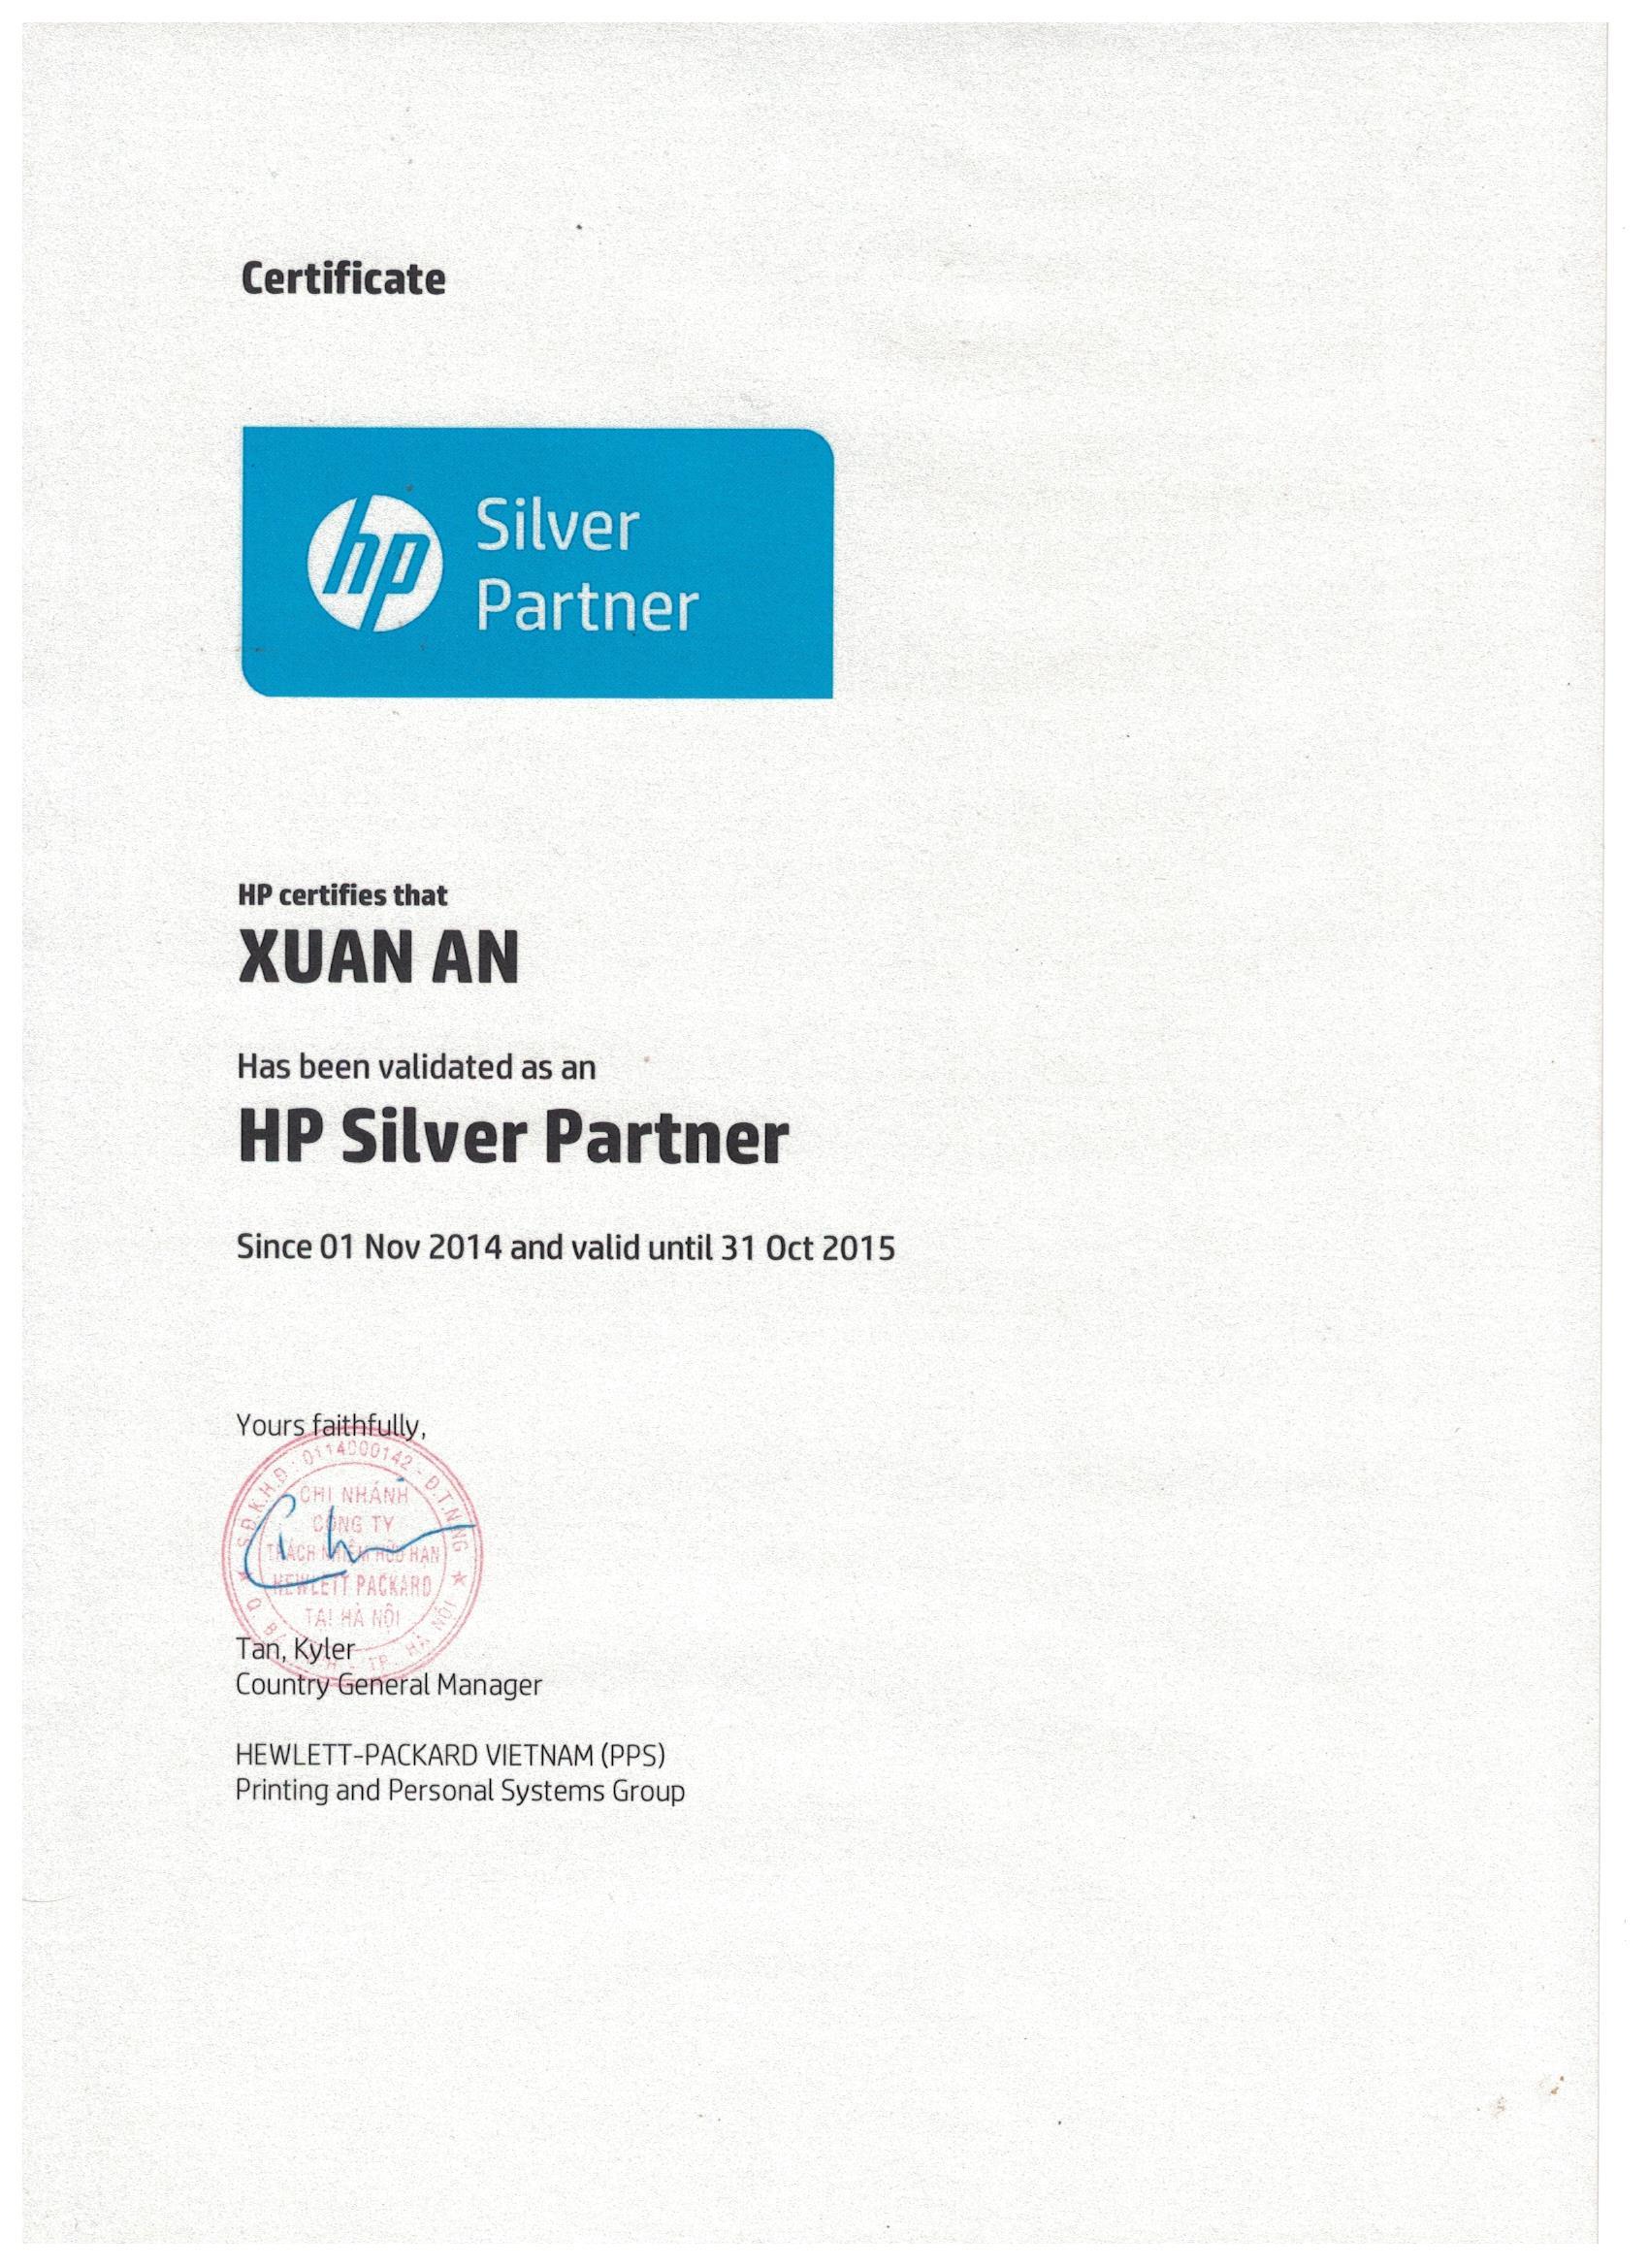 HP ProBook 450 G5 - 2XR66PA (Silver)